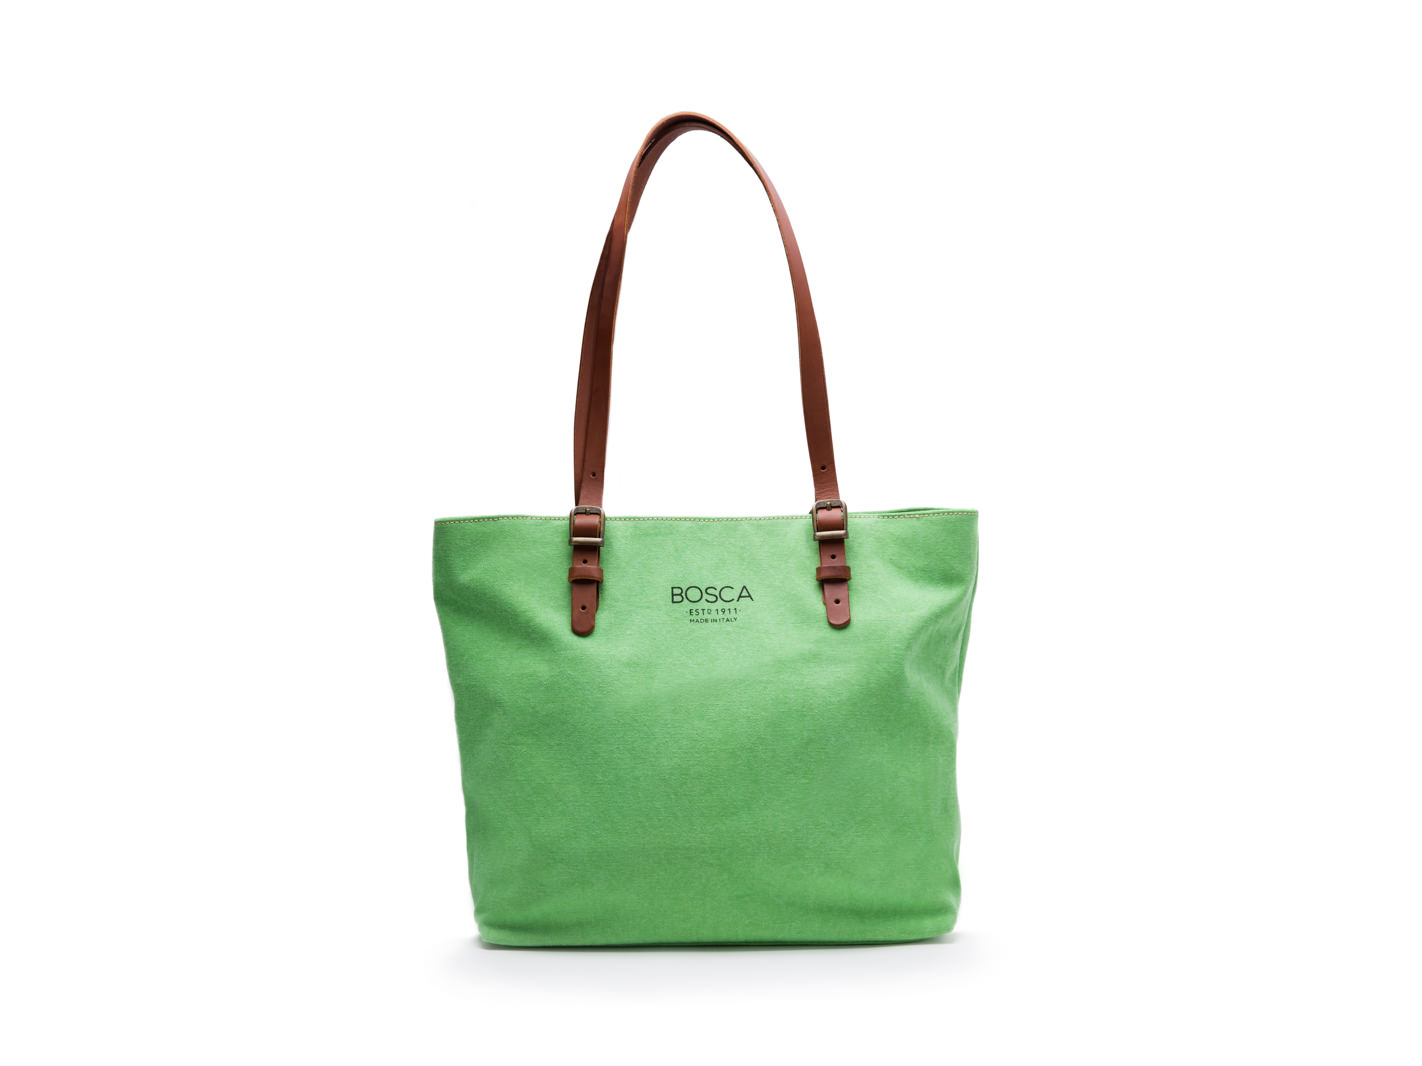 ca9747a4bdf Tuscan Tote Bag